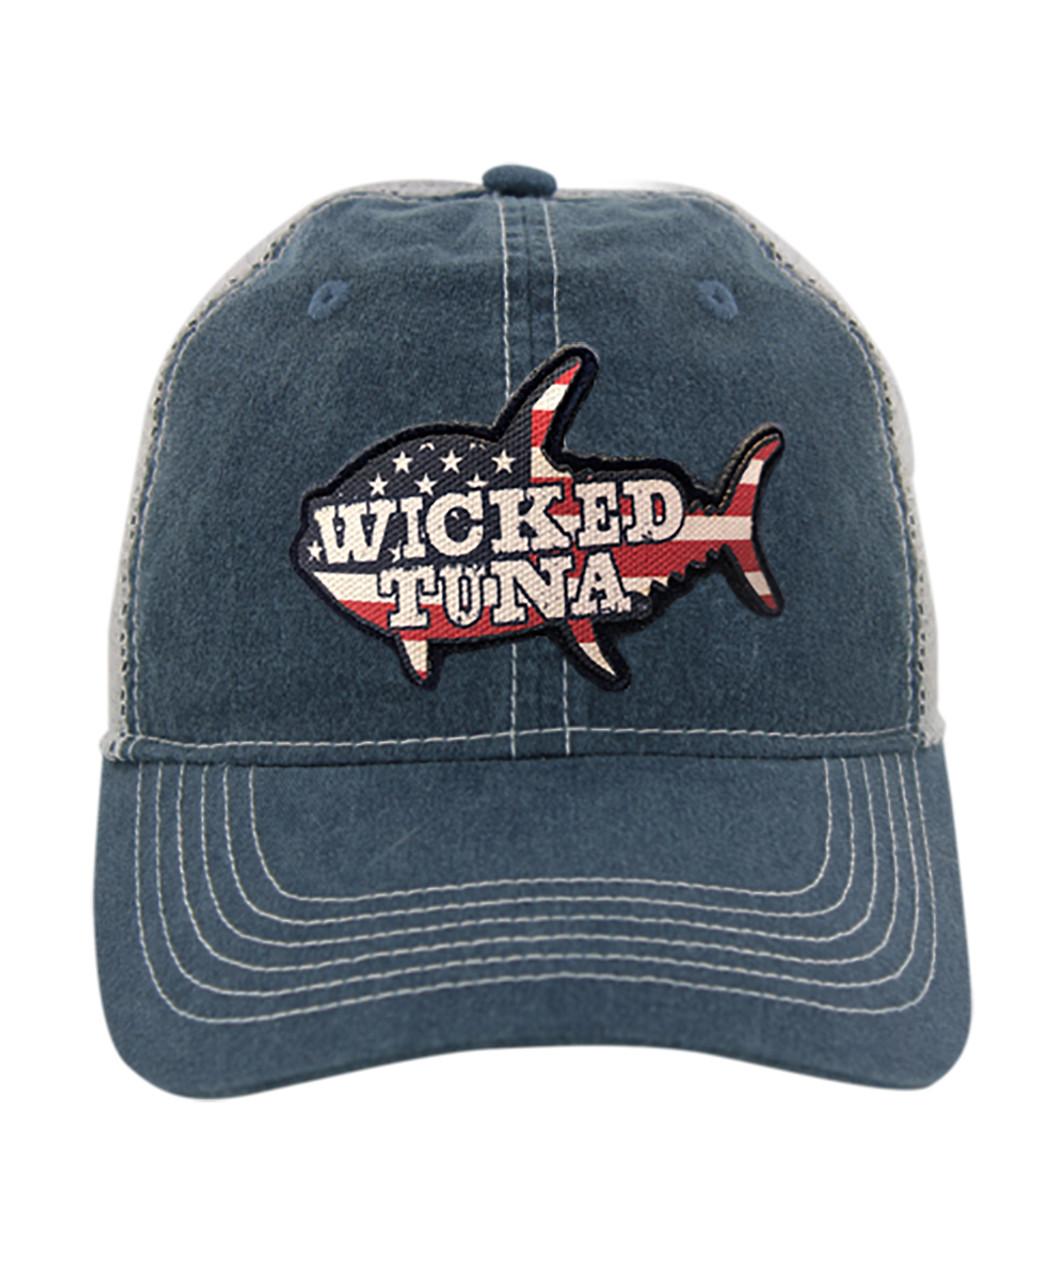 4c50f6f6432 American Flag Tuna Pigment Dyed Hat - Wicked Tuna Gear